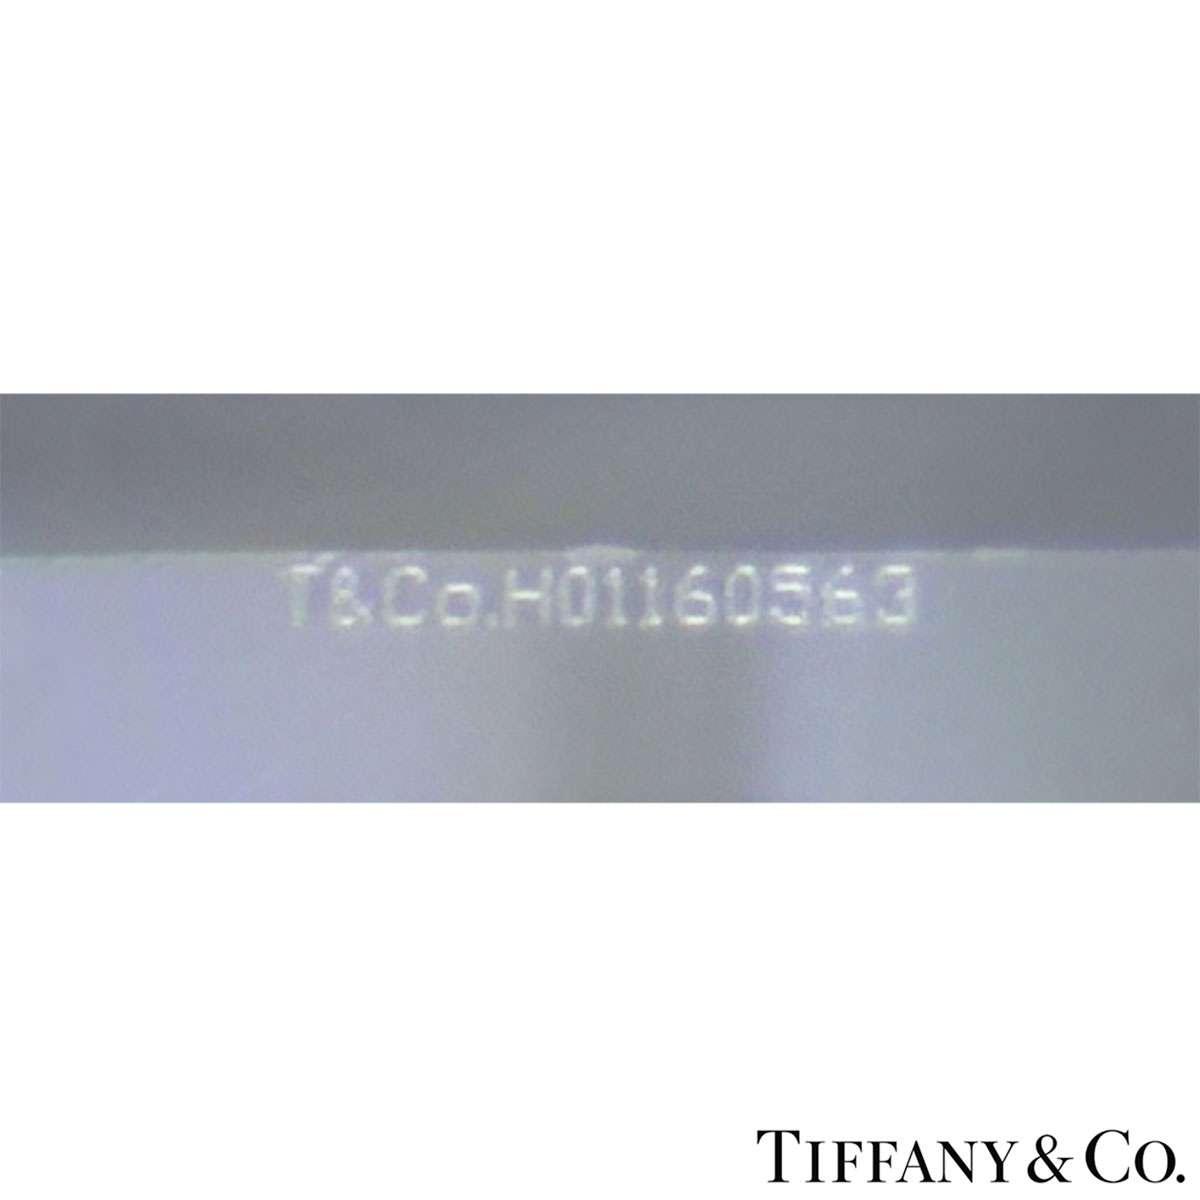 Tiffany & Co. Lucida Cut Diamond Ring 1.53ct E/VS1